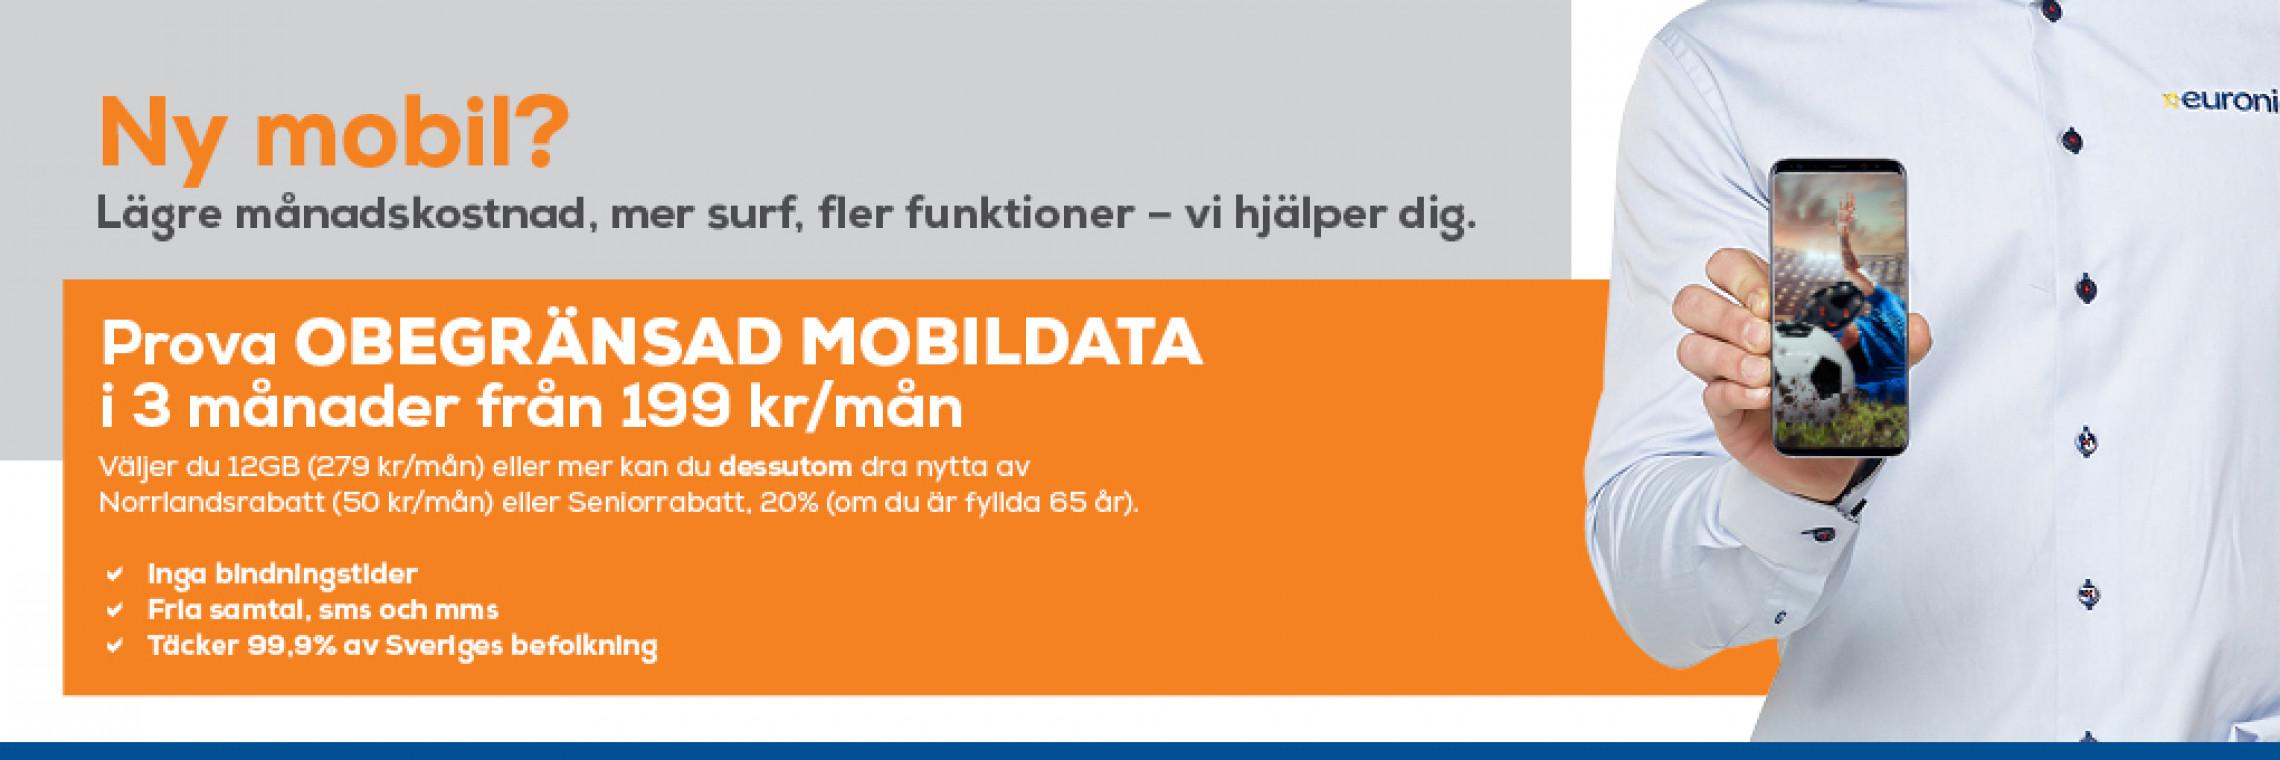 obegransad_mobildata.jpg